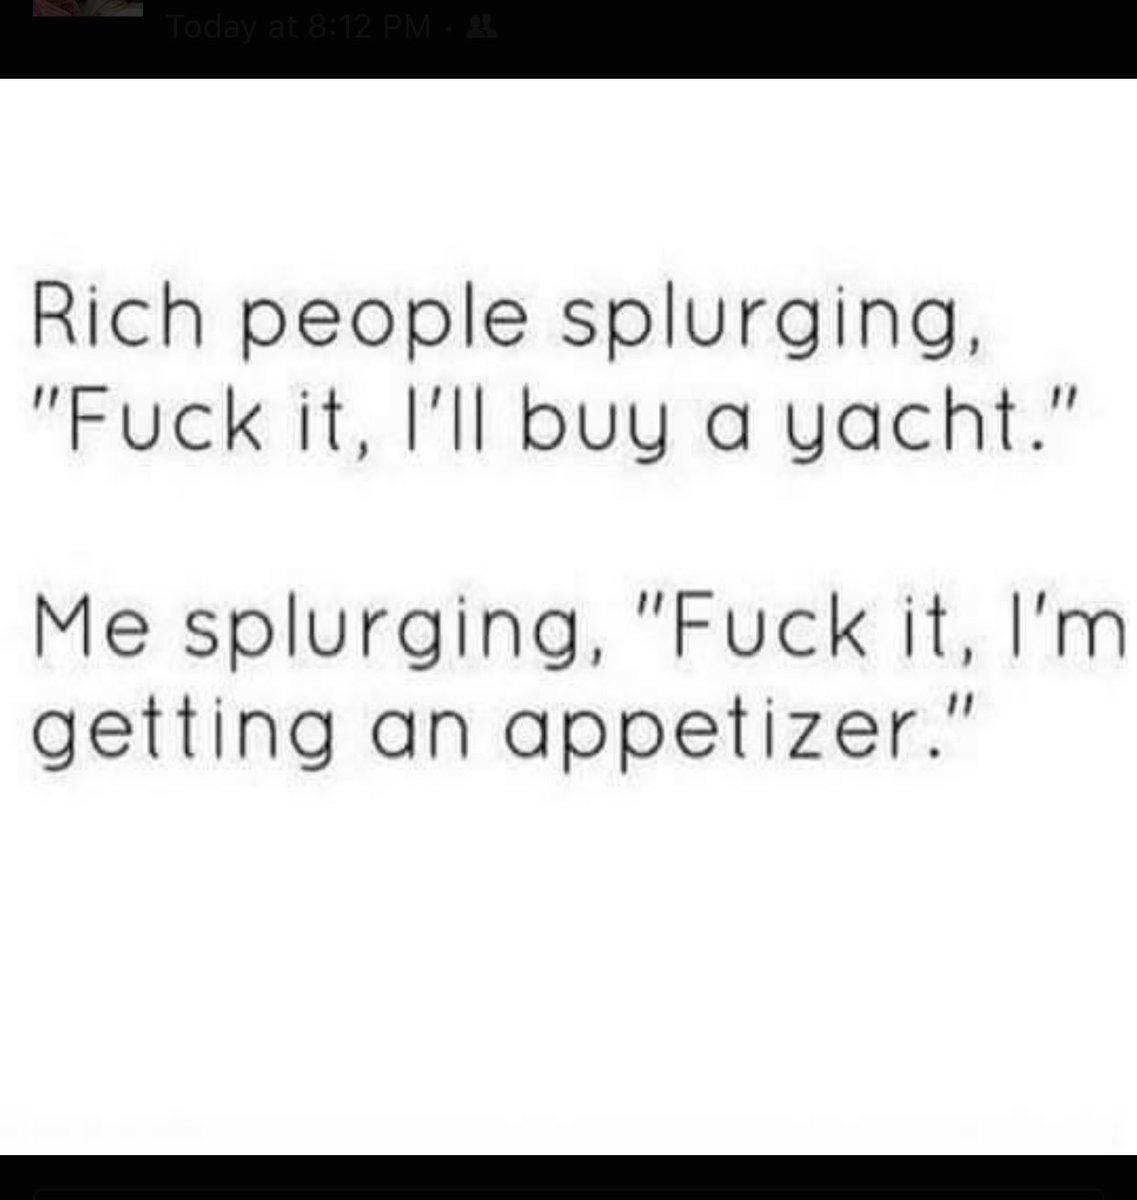 My life summed up https://t.co/3nzDtxzhfp